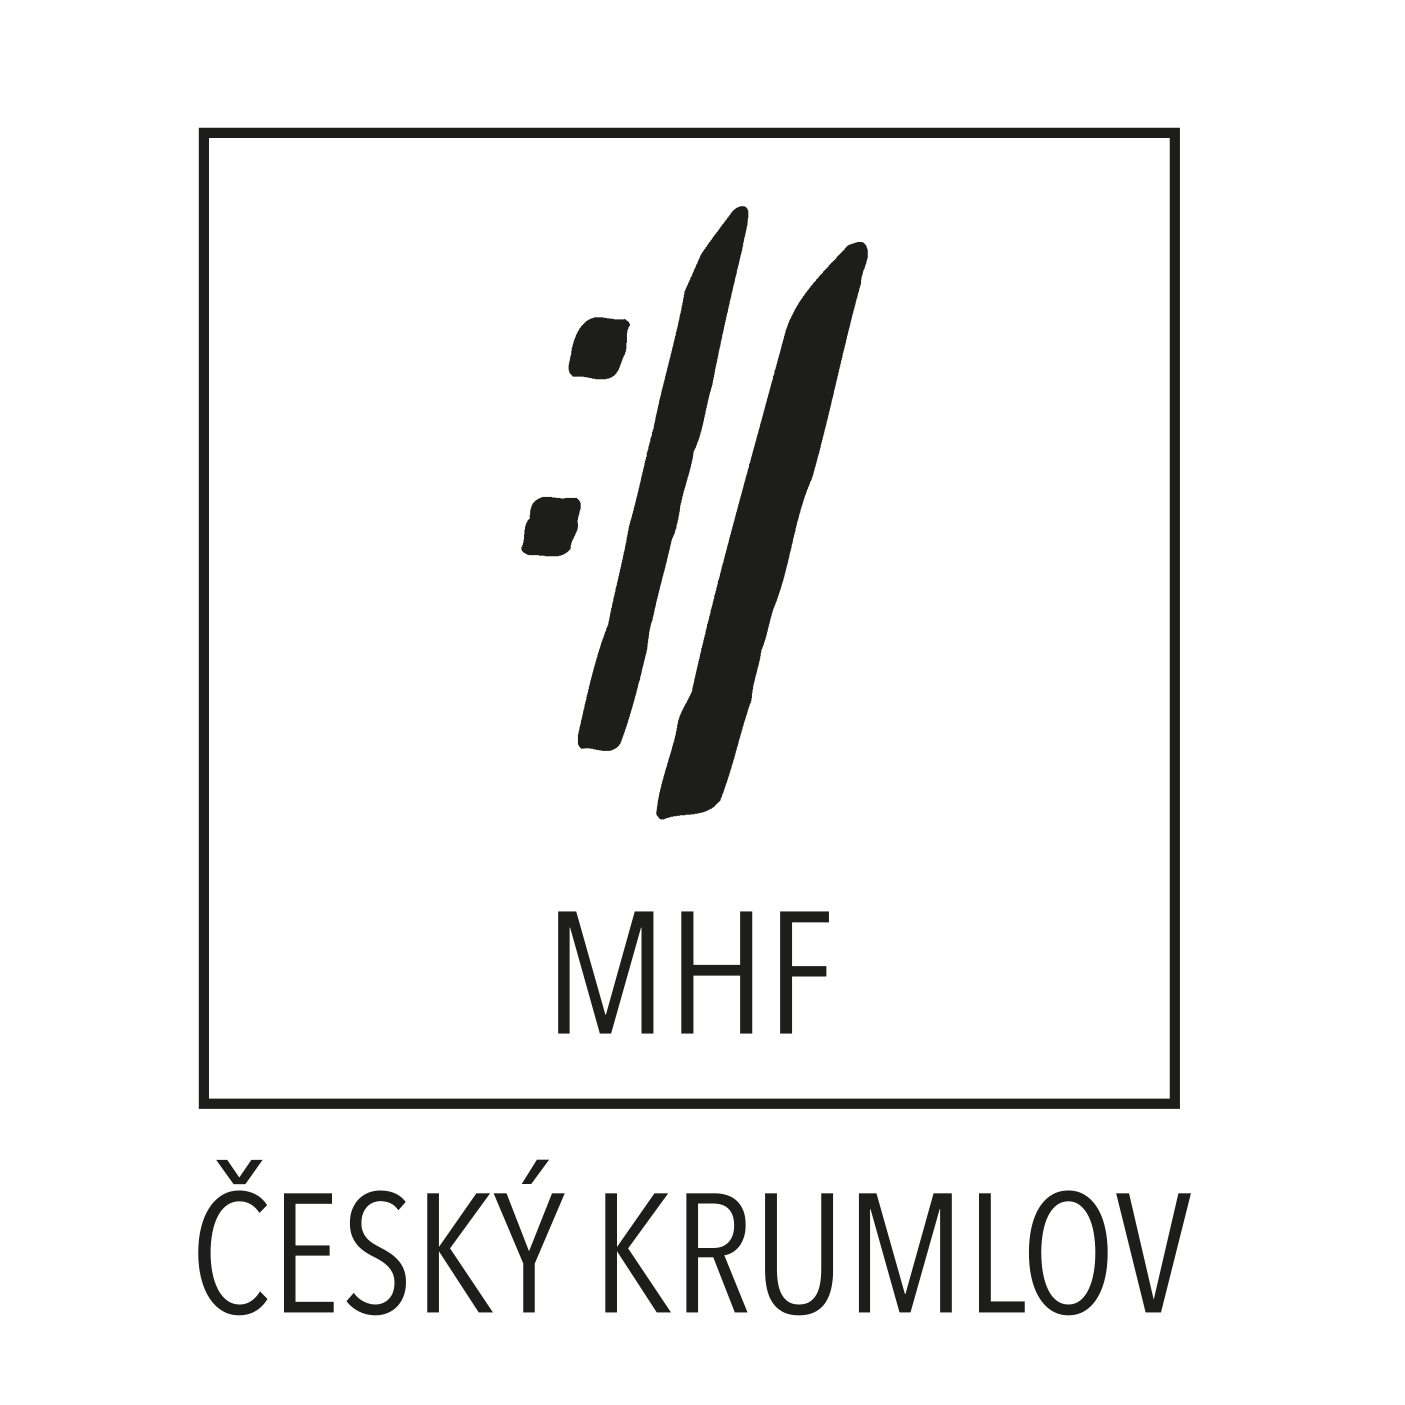 MHF CK - logo